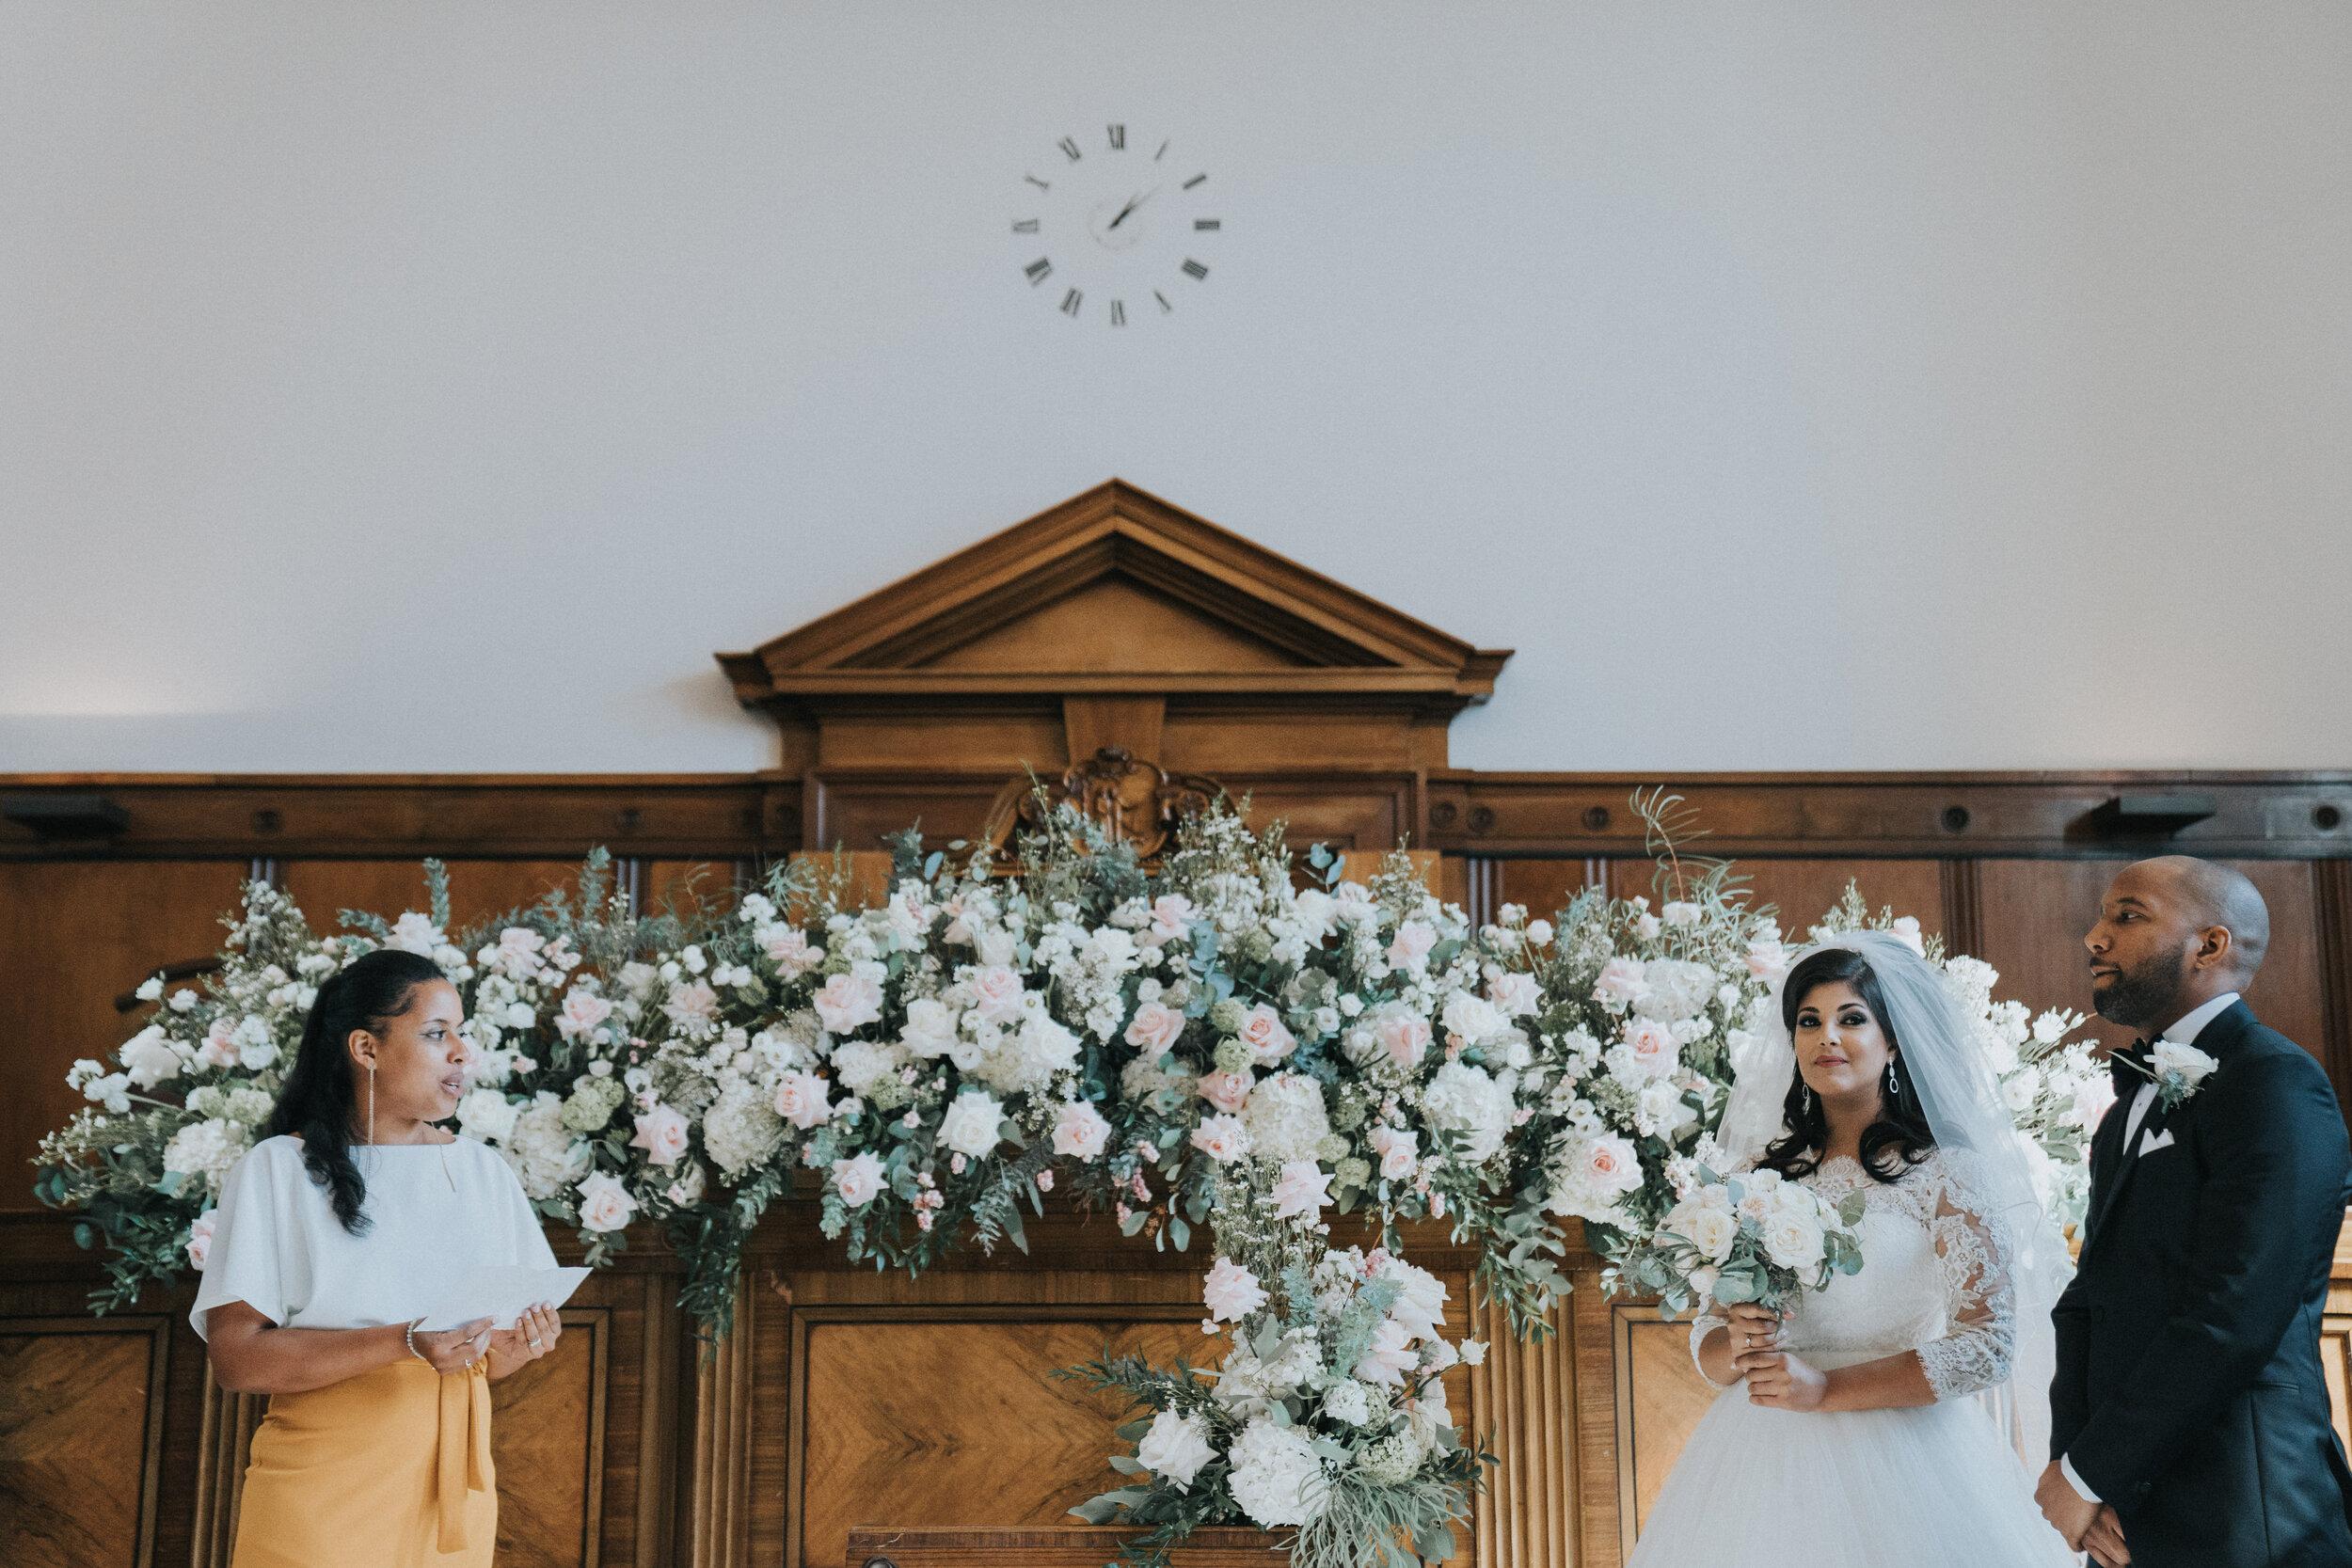 east-london-wedding-photographer-videographer-patriot-square-apartments-36